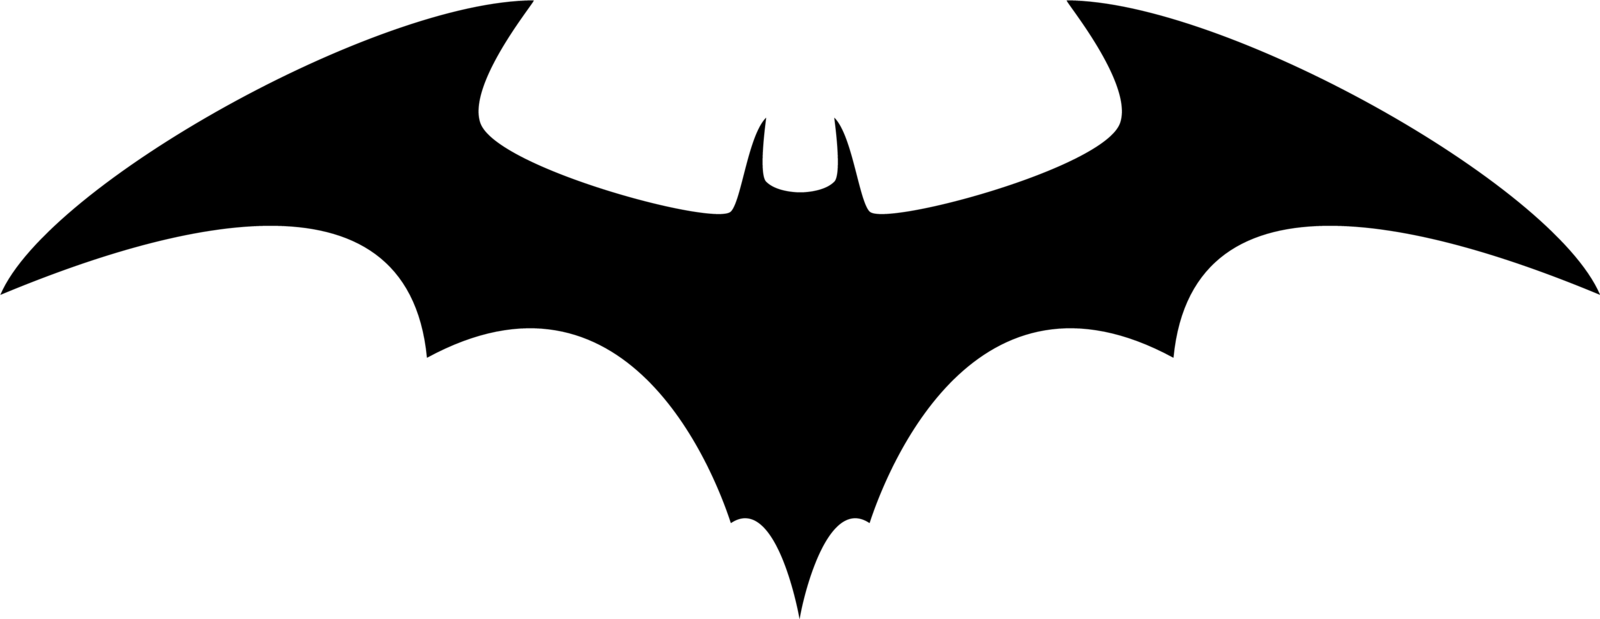 Bat Symbol Png , (+) Pictures.